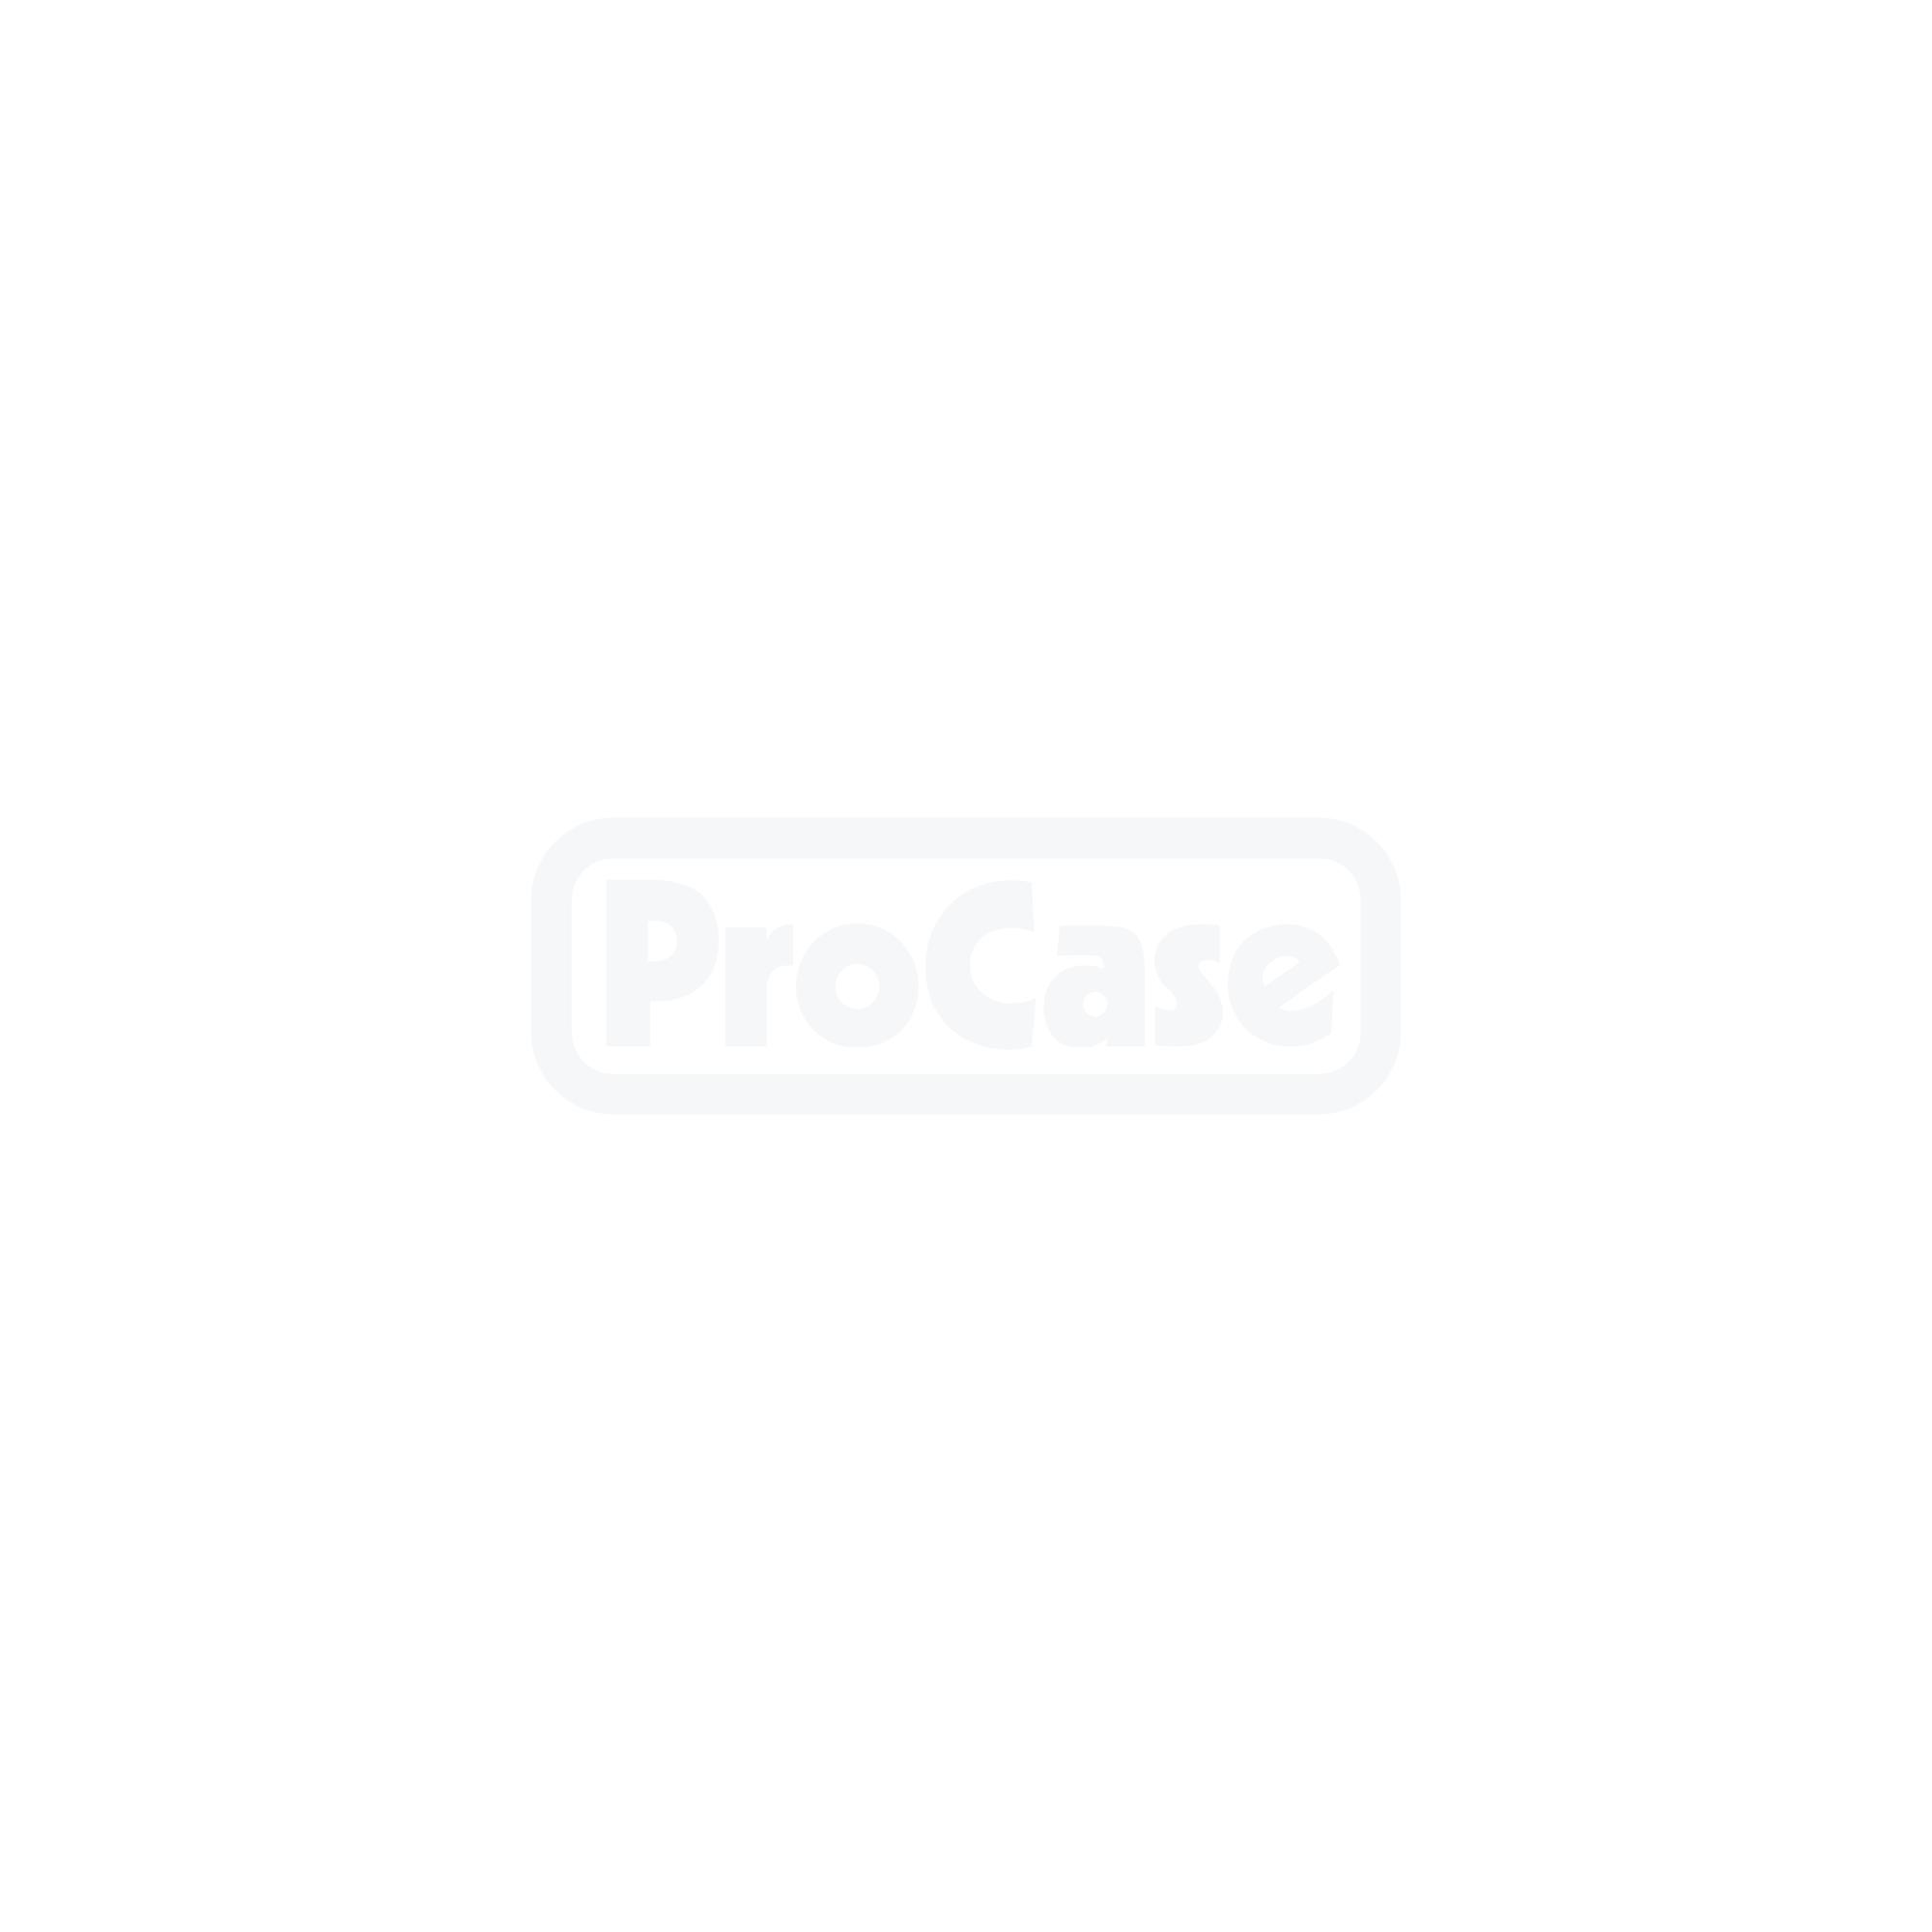 Flightcase für Beamer Optik variabel